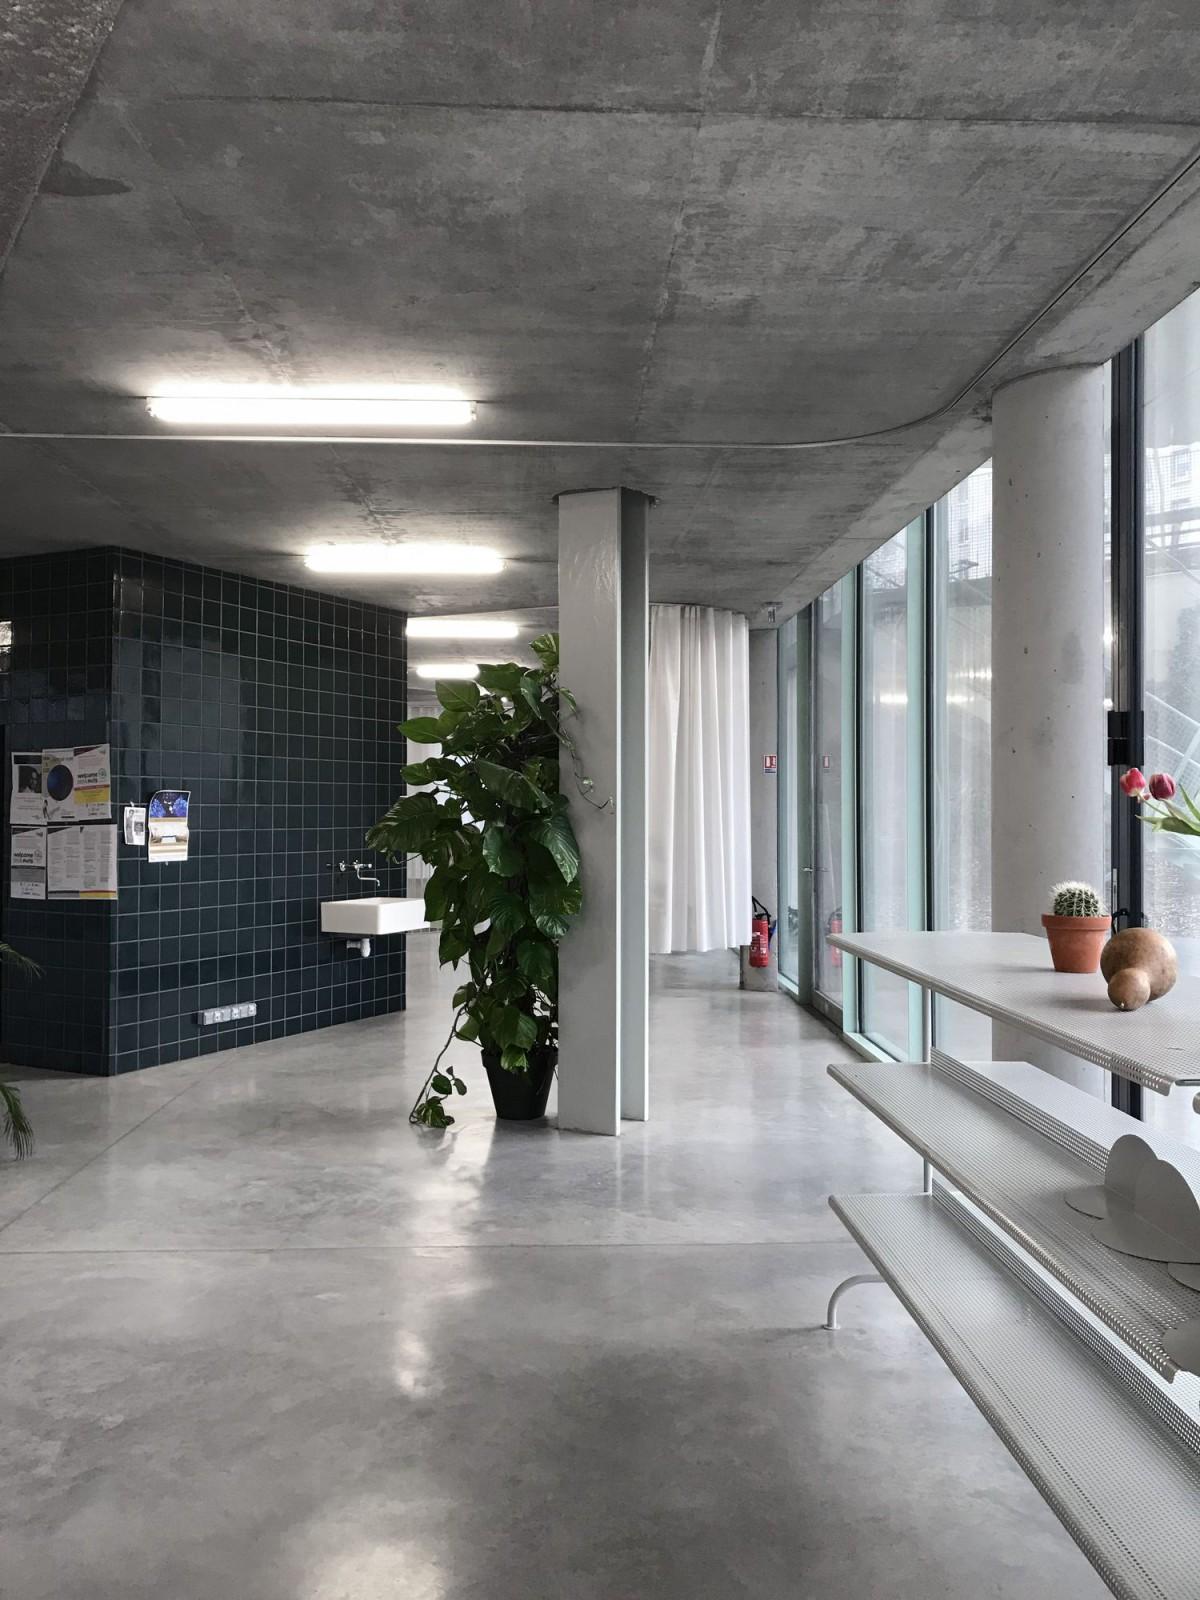 BRUTHER . Julie-Victoire Daubié Residence for Researchers . Paris afasia (1)